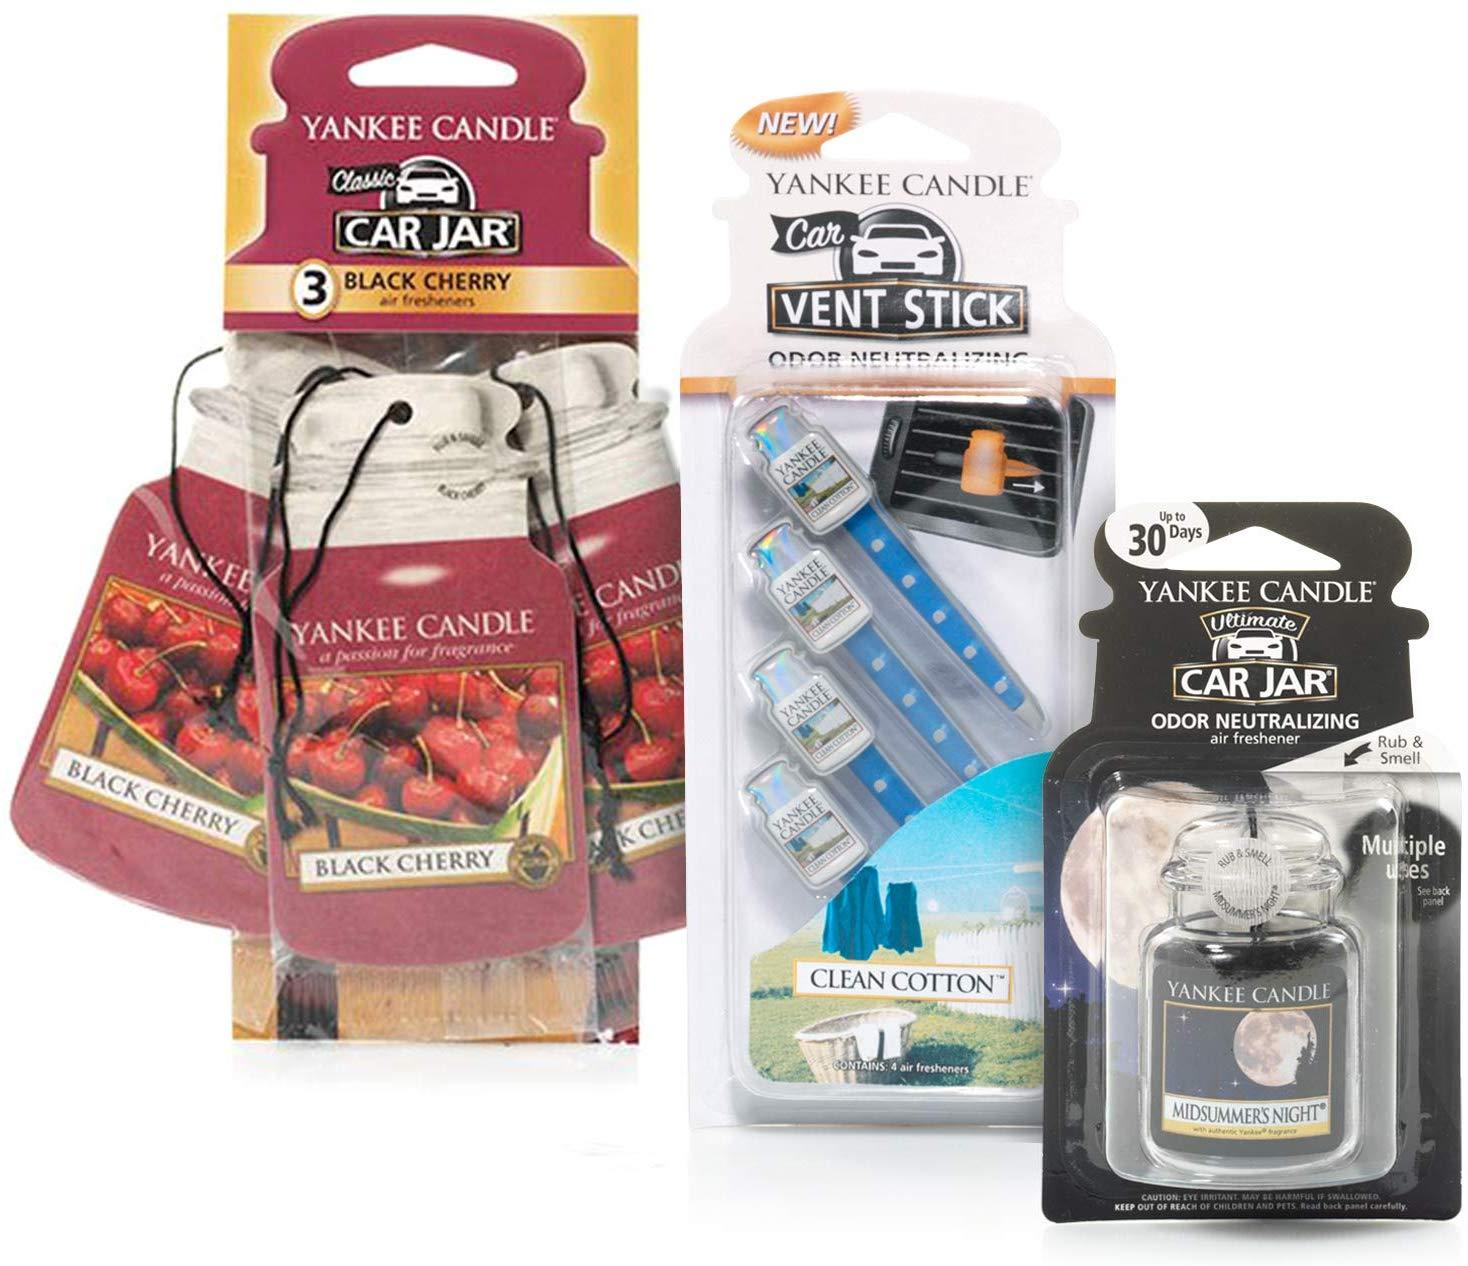 Yankee Candle Air Freshener Bundle (8pcs) £11.20 at Amazon Prime / £15.69 Non Prime